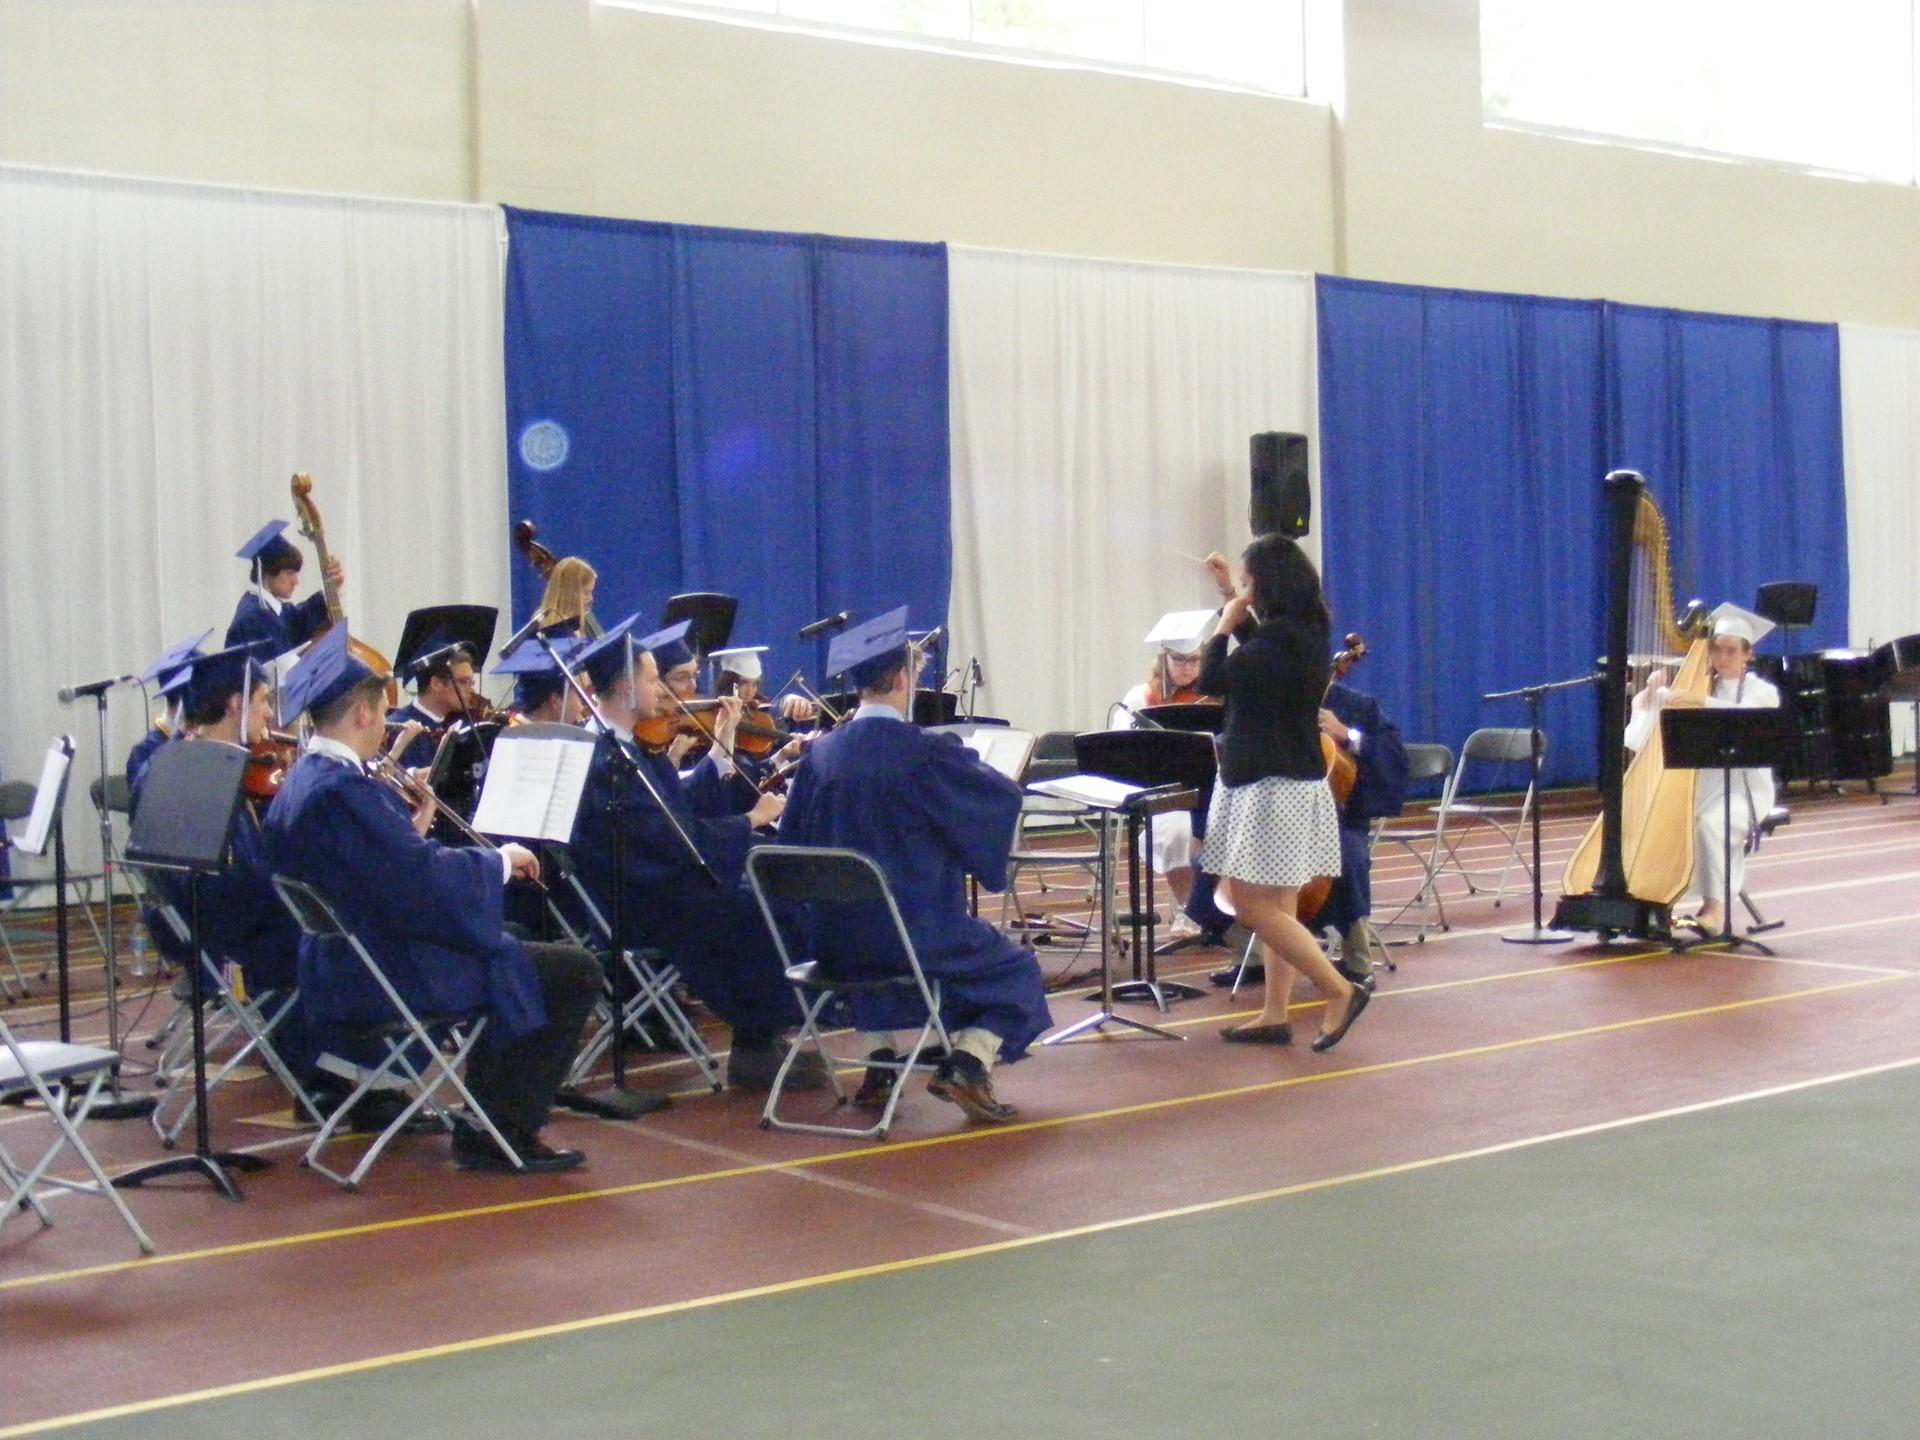 Class of 2017 Graduation - May 28